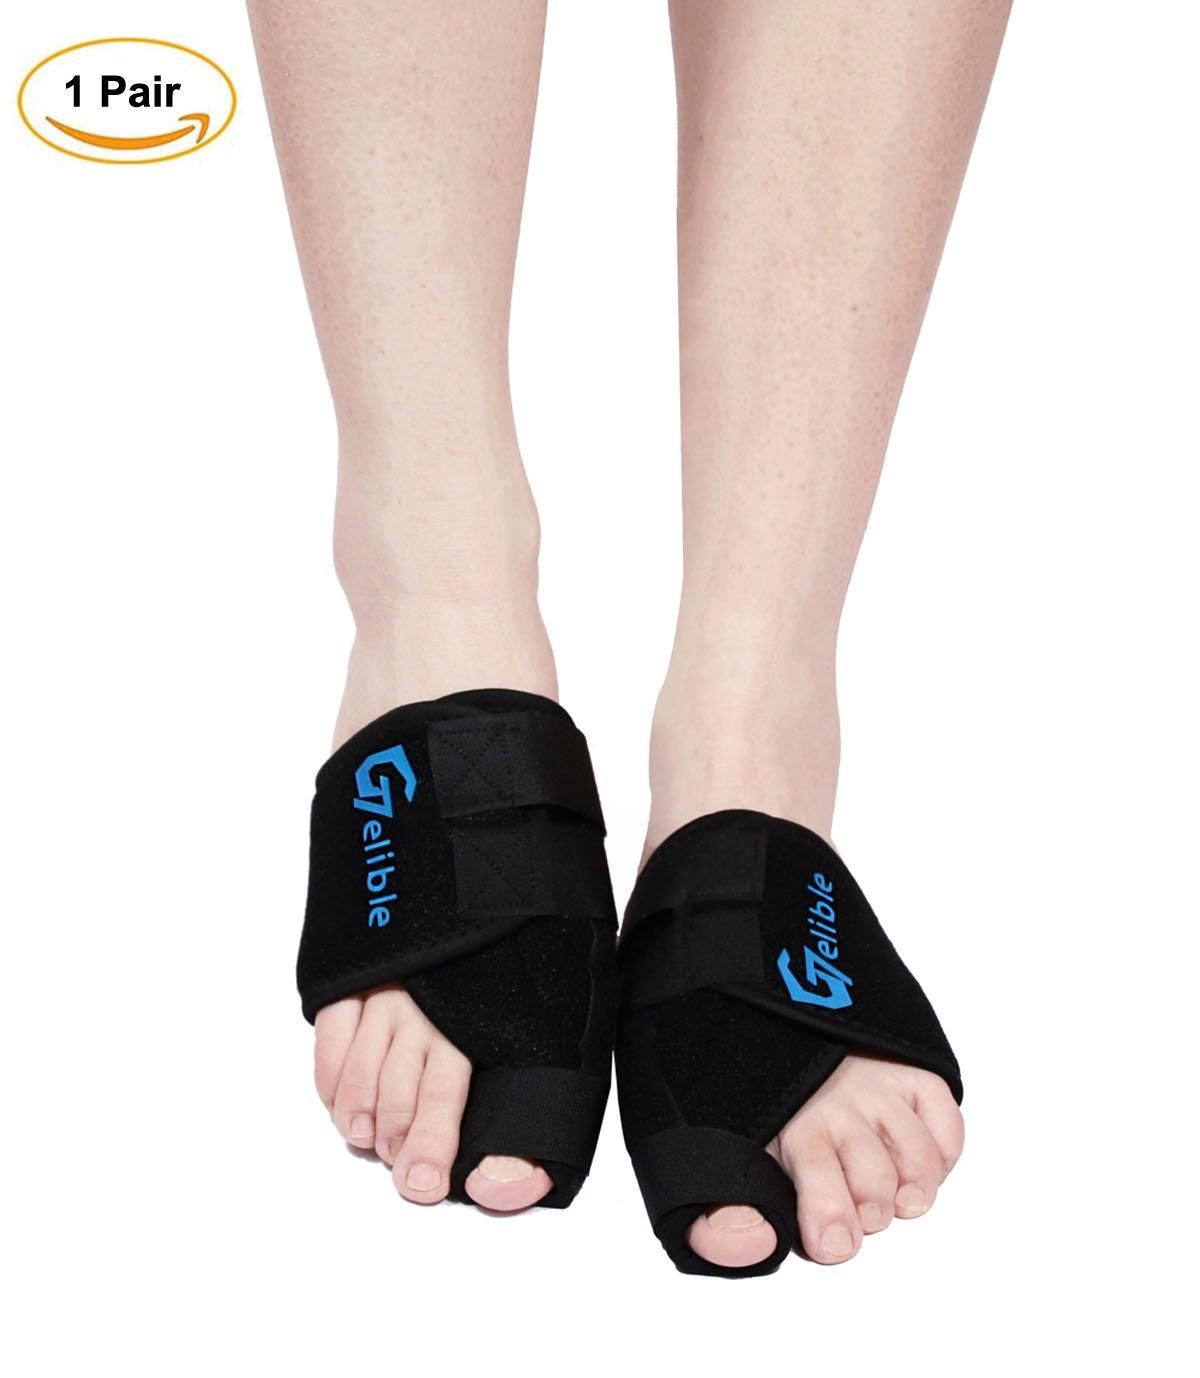 Bunion Toe Corrector,Gelible 1 Pair Toe Straightener Splints for Hallux Valgus, Overlapping Toe, Turf Toe, Bunion Pain Aid Surgery